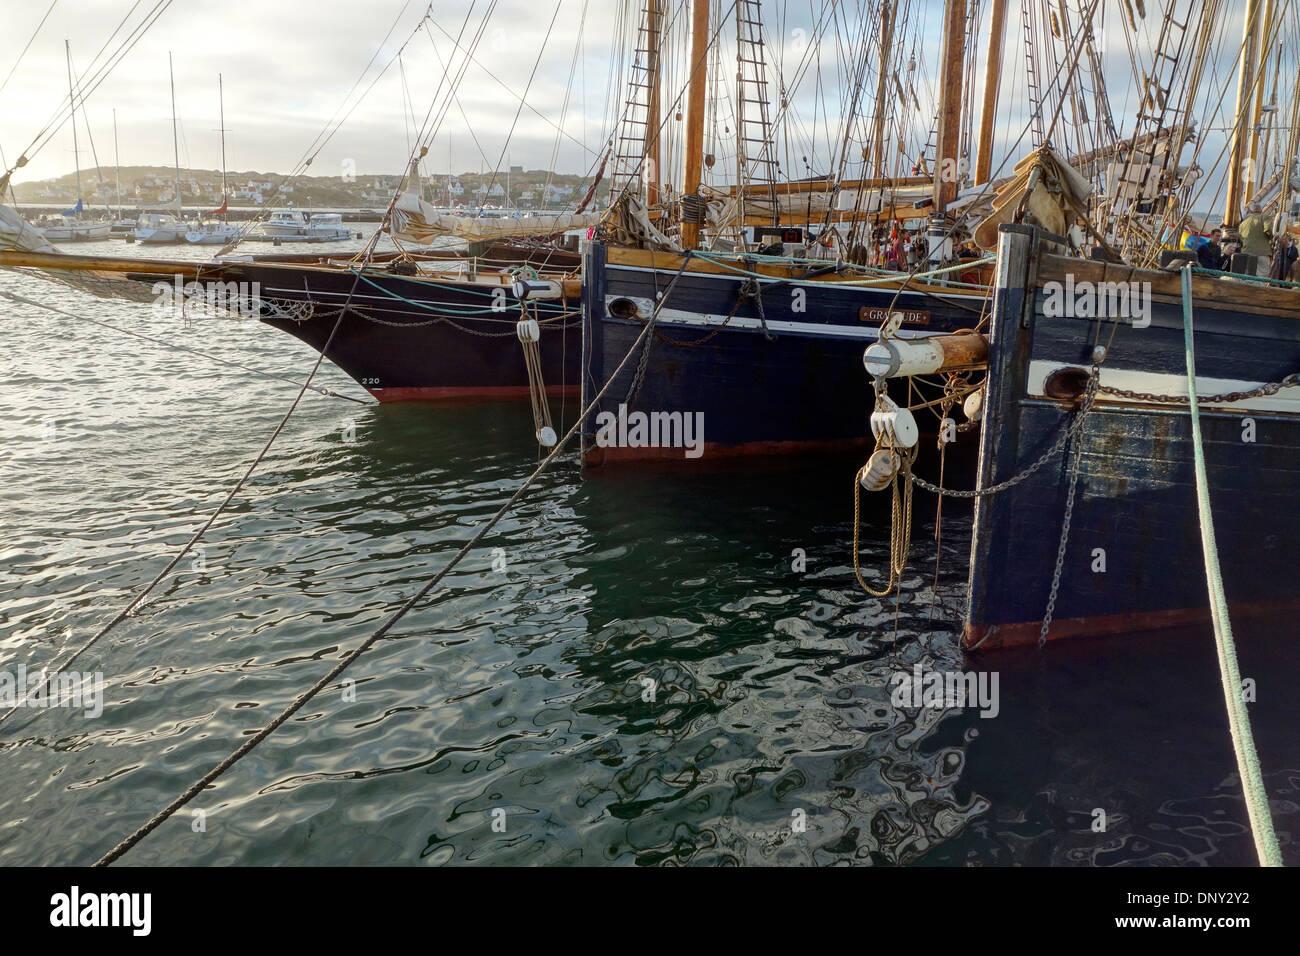 Bows of schooners on mooring in a harbour of Björko island. Bohuslan, Sweden. - Stock Image